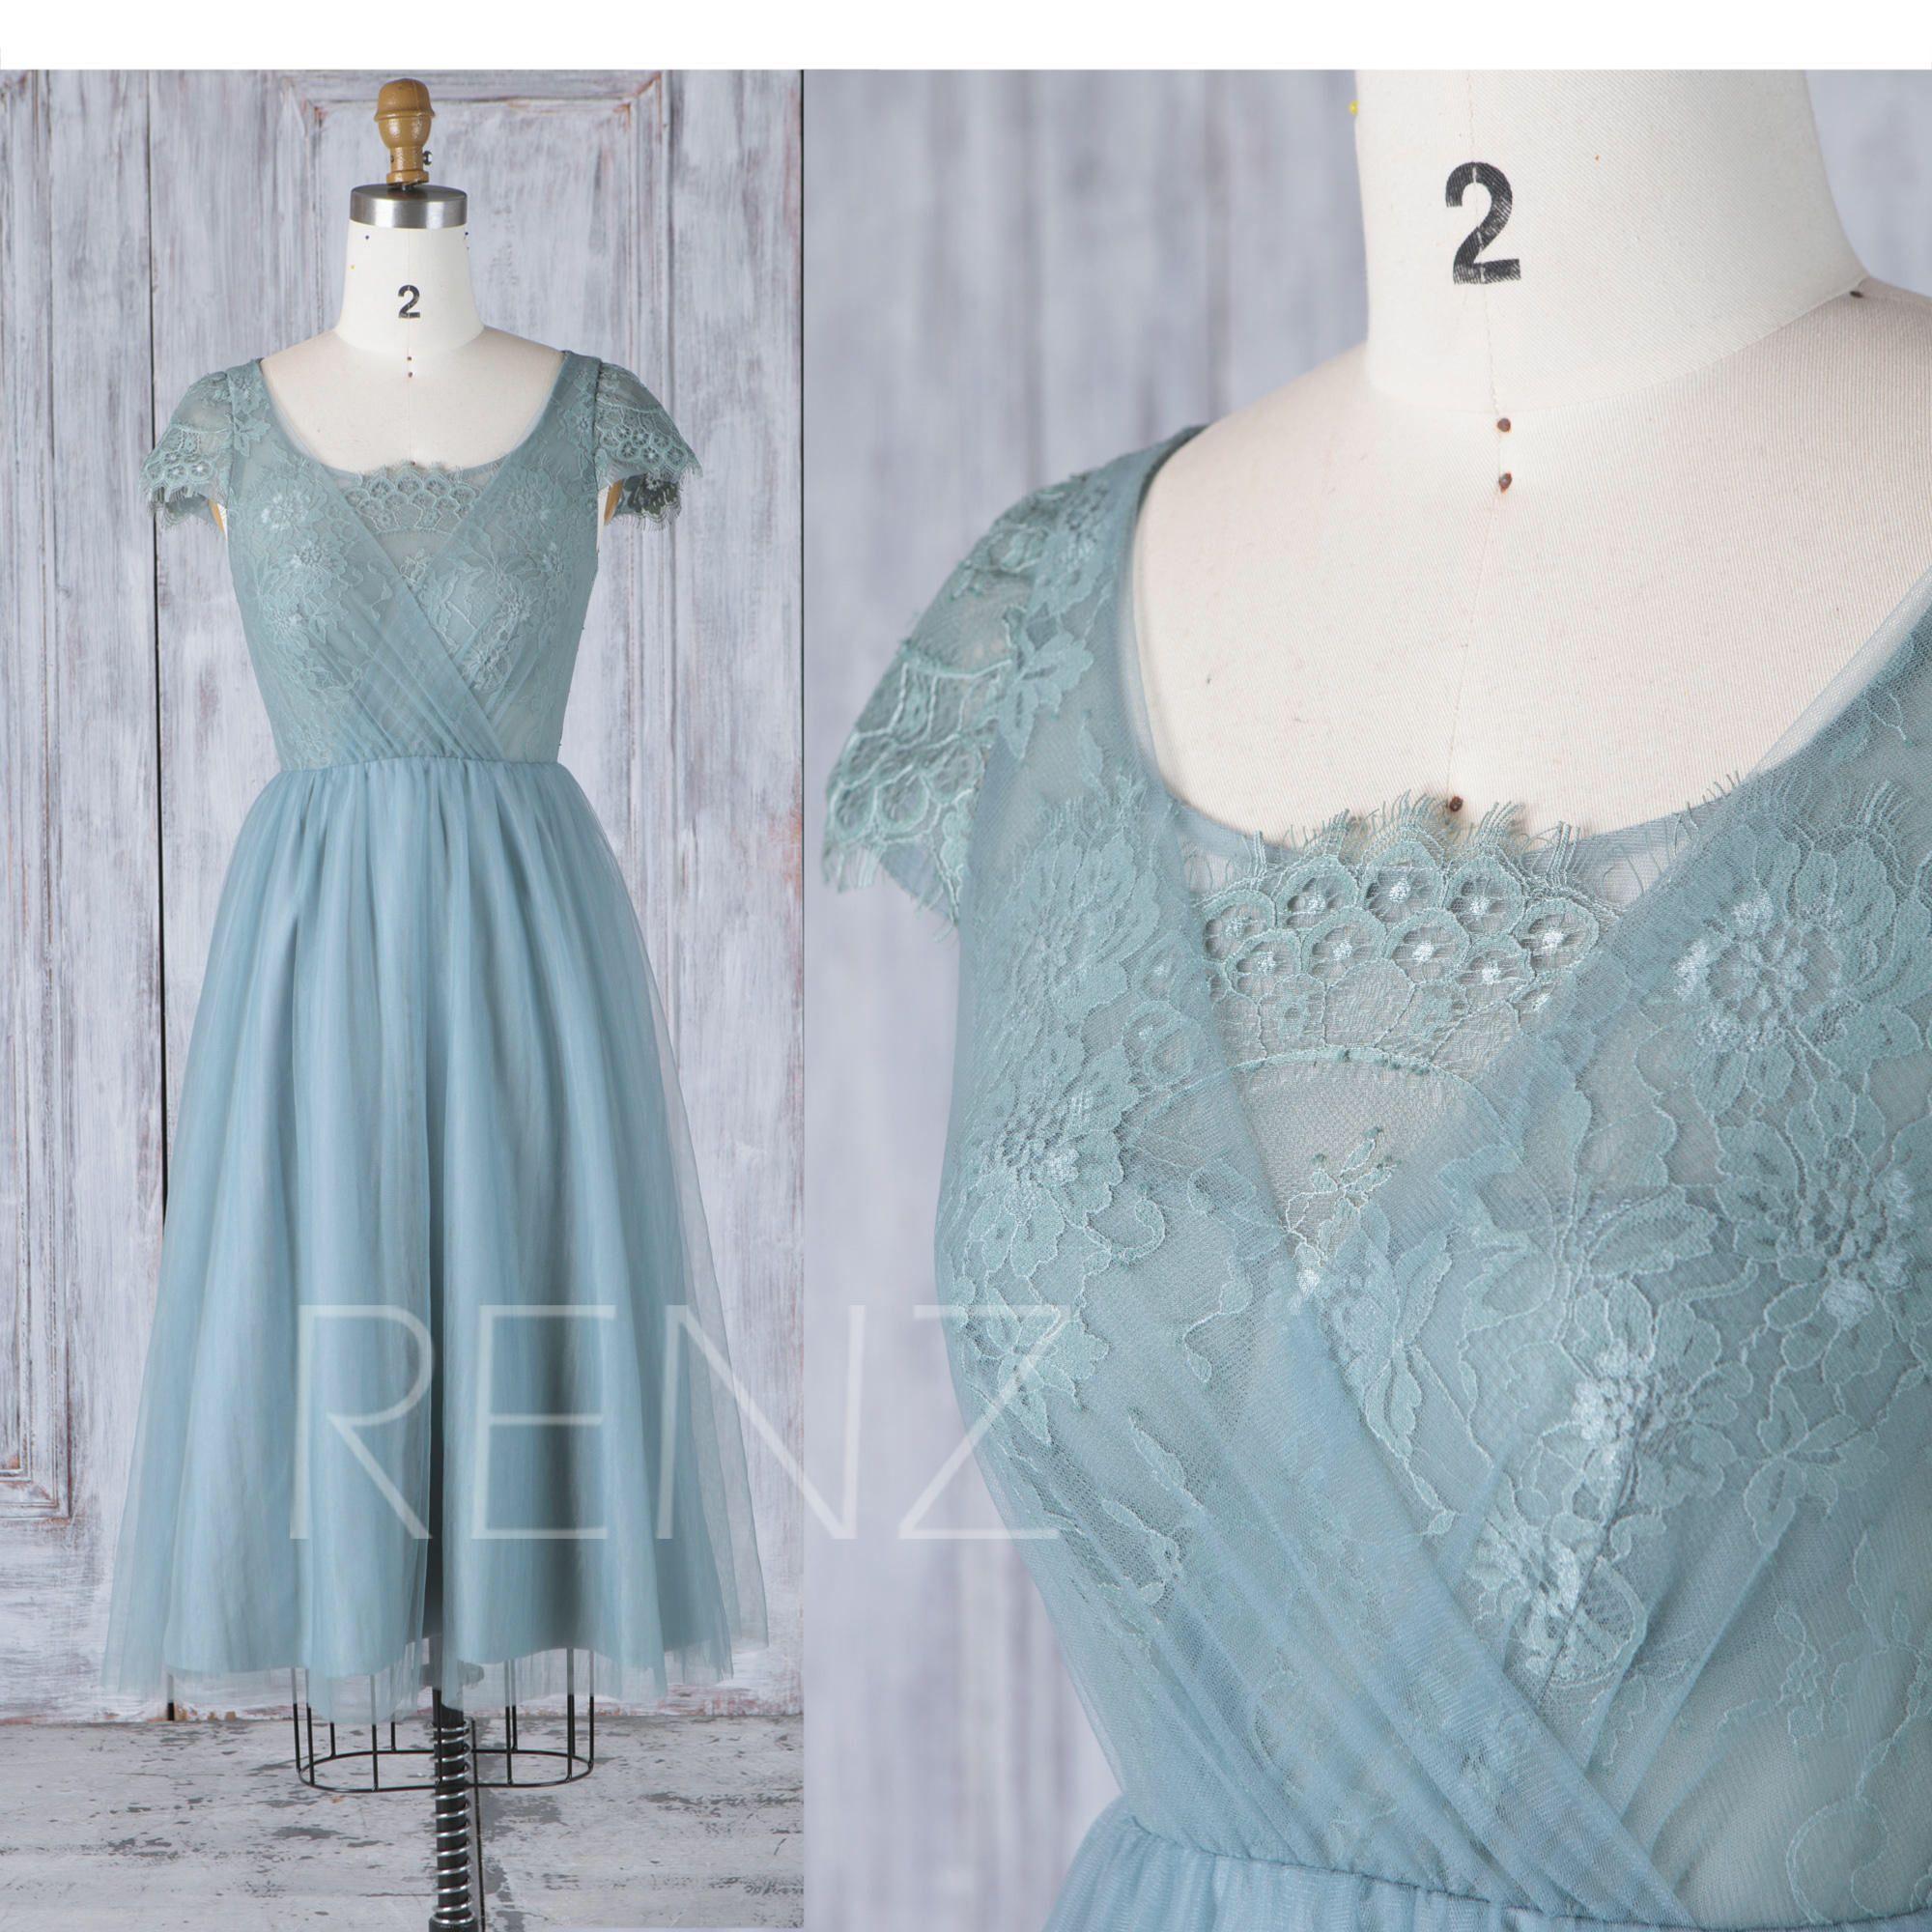 Dusty blue tulle bridesmaid dressscoop neck wedding dresscap